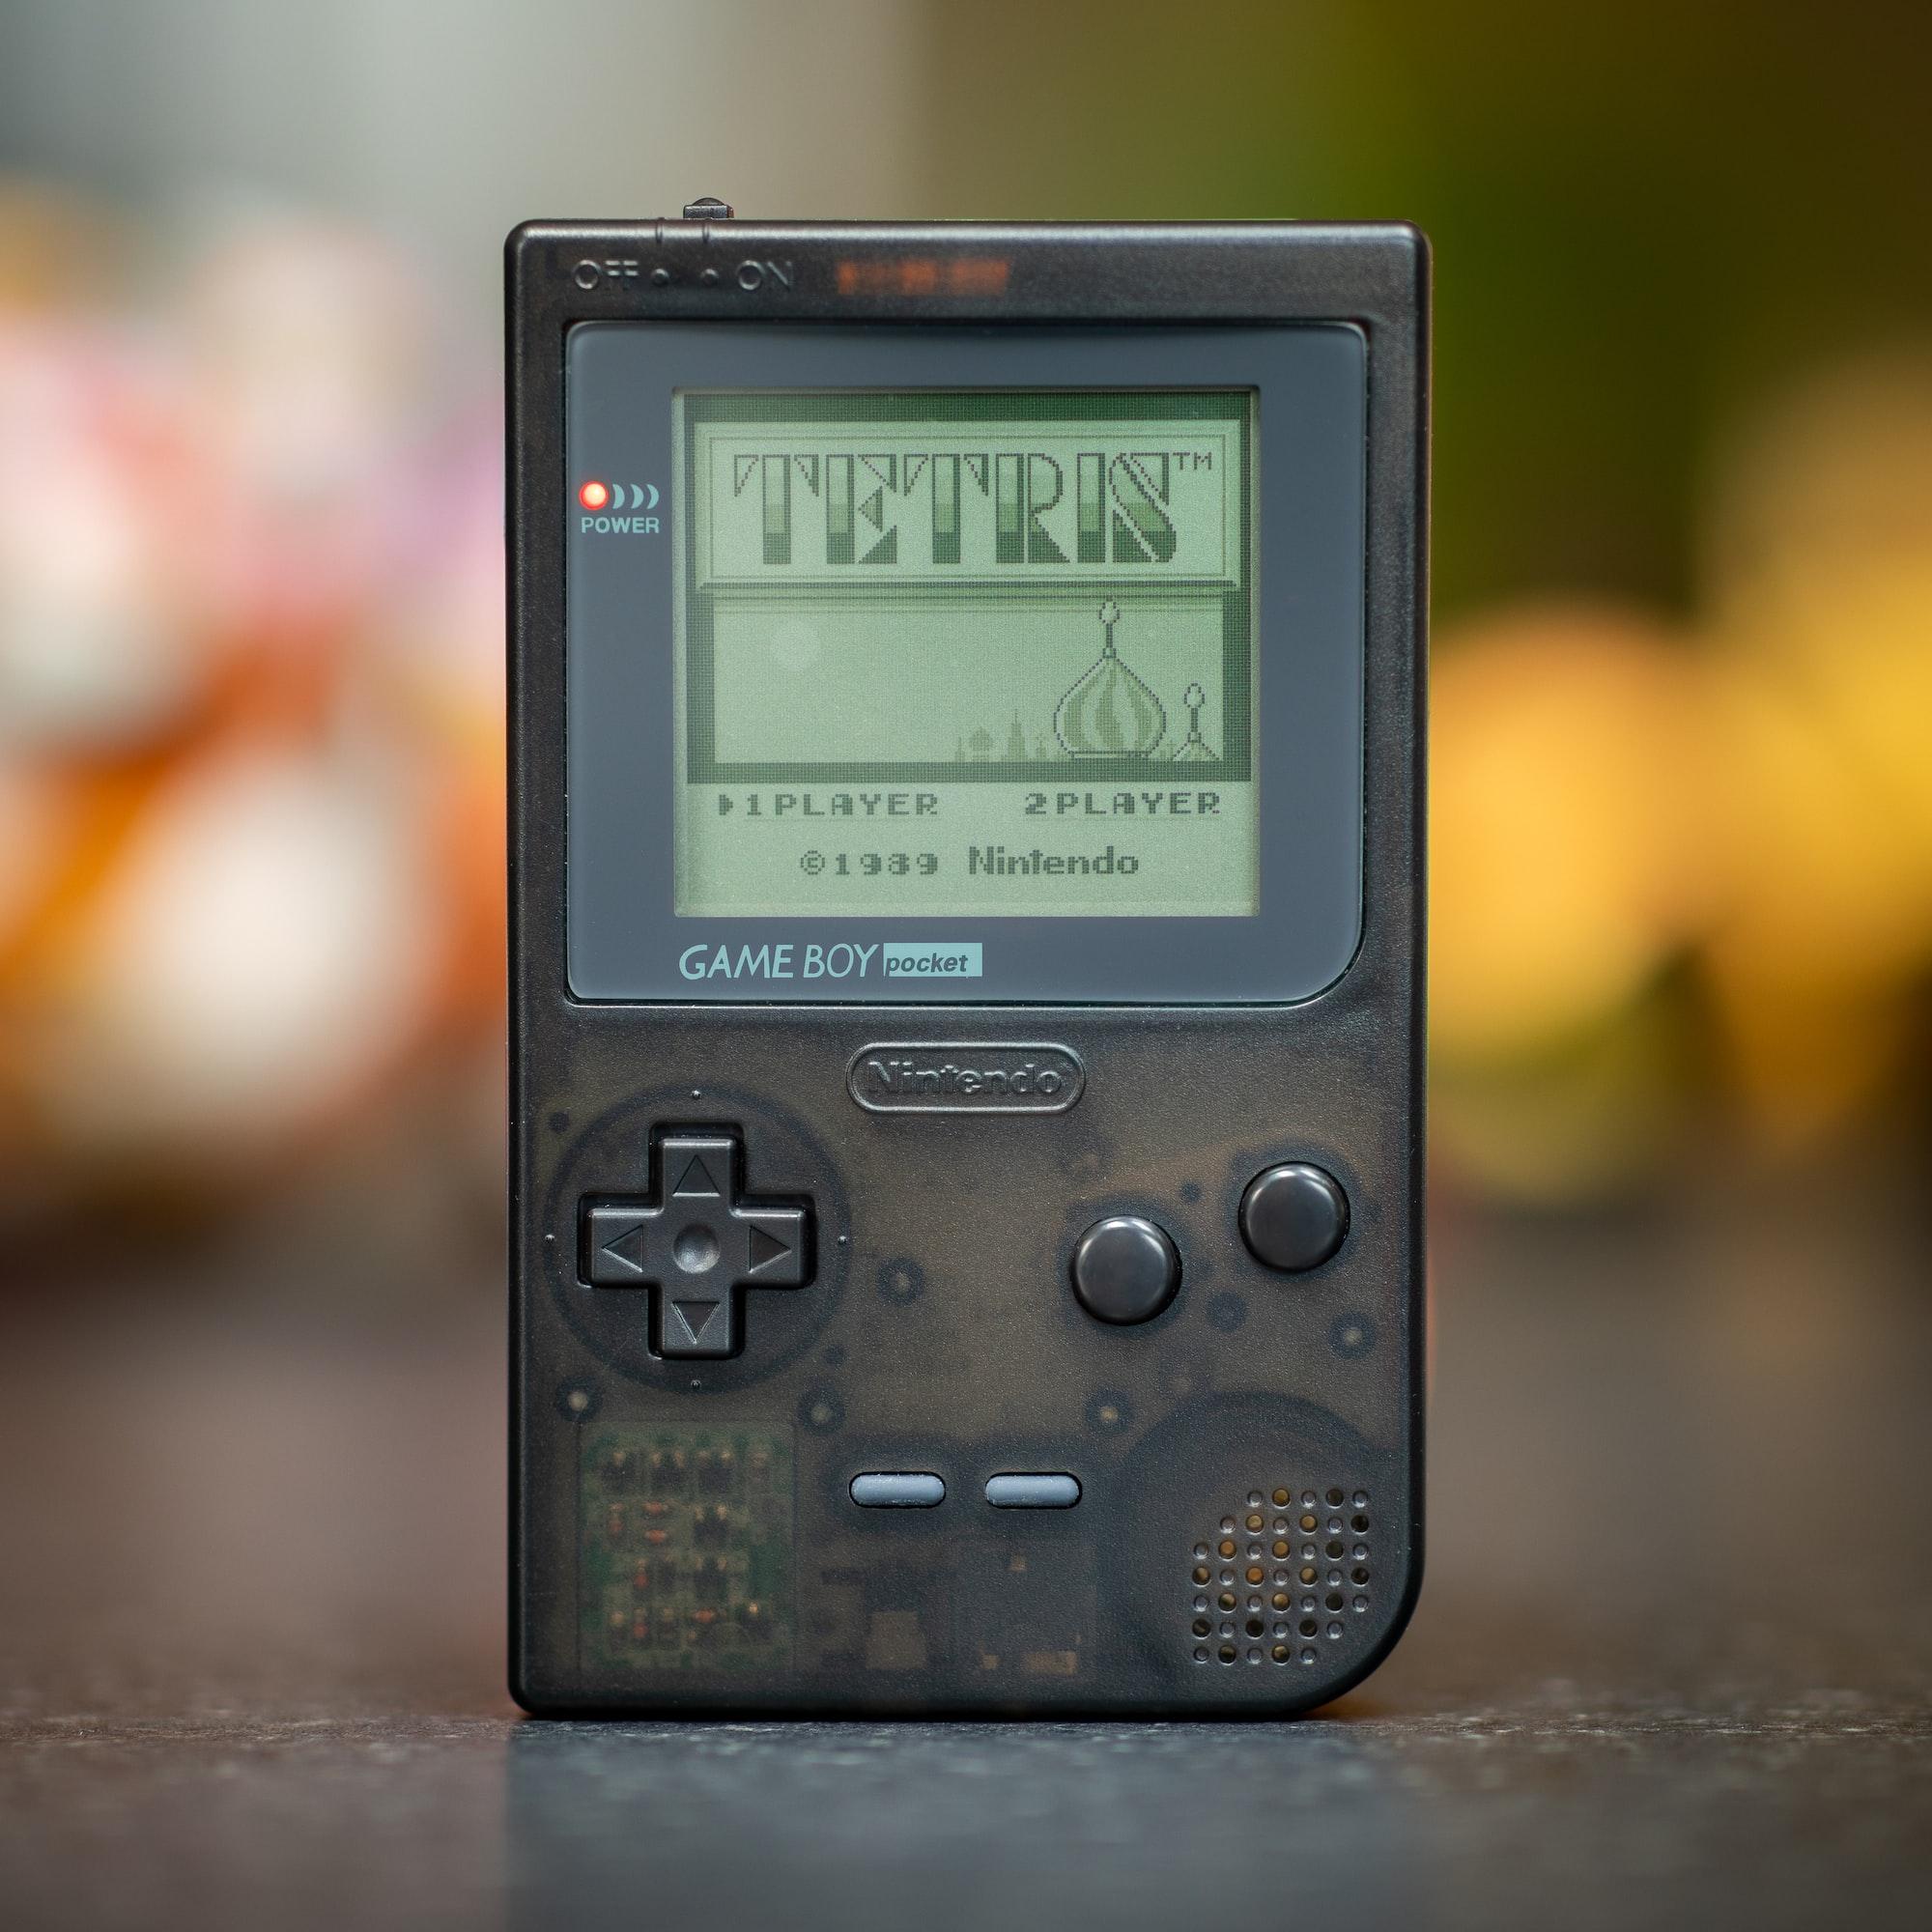 An original Nintendo Gameboy Pocket that has had a new RetroSix semi transparent shell applied.